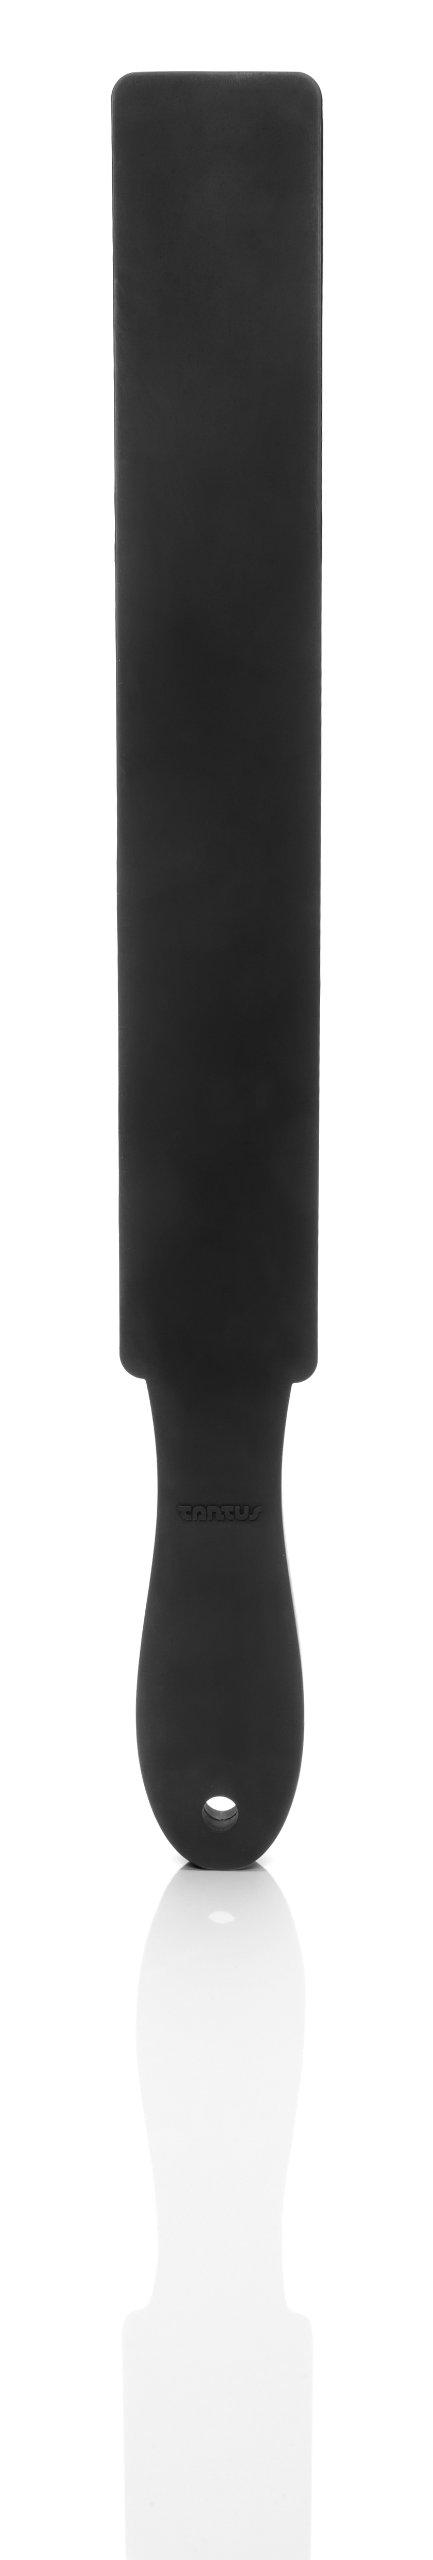 Tantus Snap Strap - Ultra-Premium Silicone Paddle by Tantus